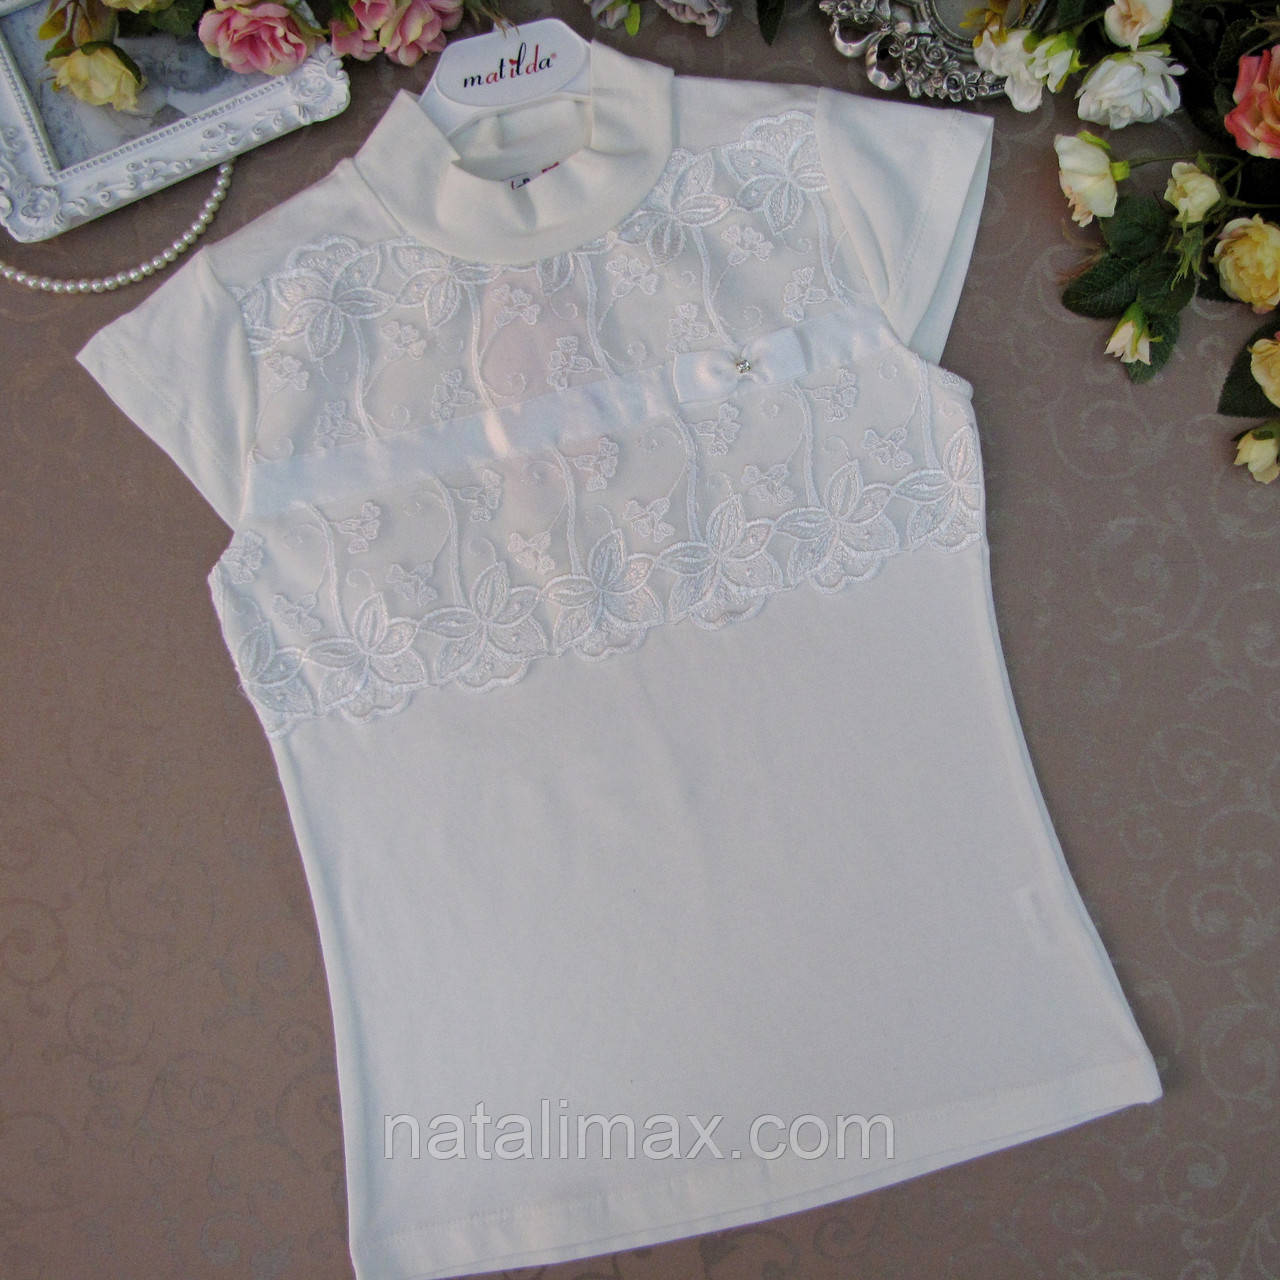 9c46fb7e571 Блузка школьная для девочек 8-14 лет.